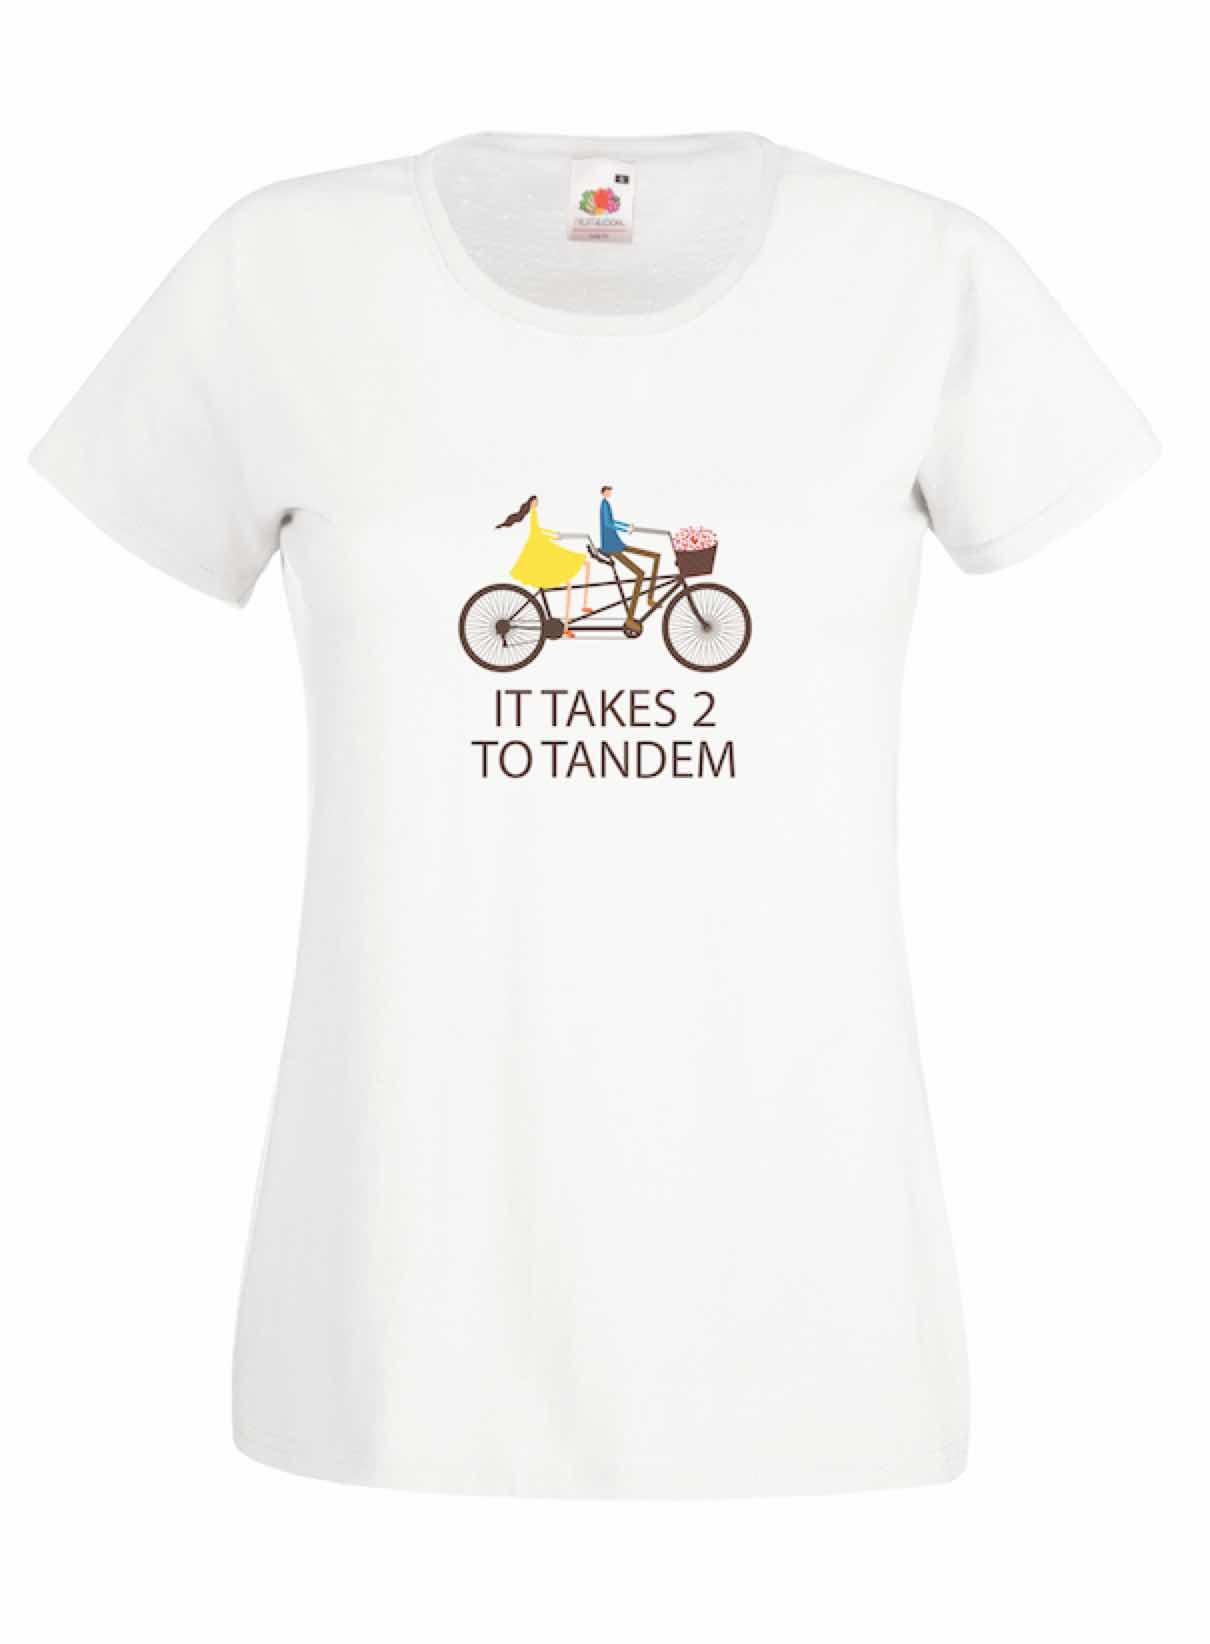 It Takes 2 To Tandem design for t-shirt, hoodie & sweatshirt